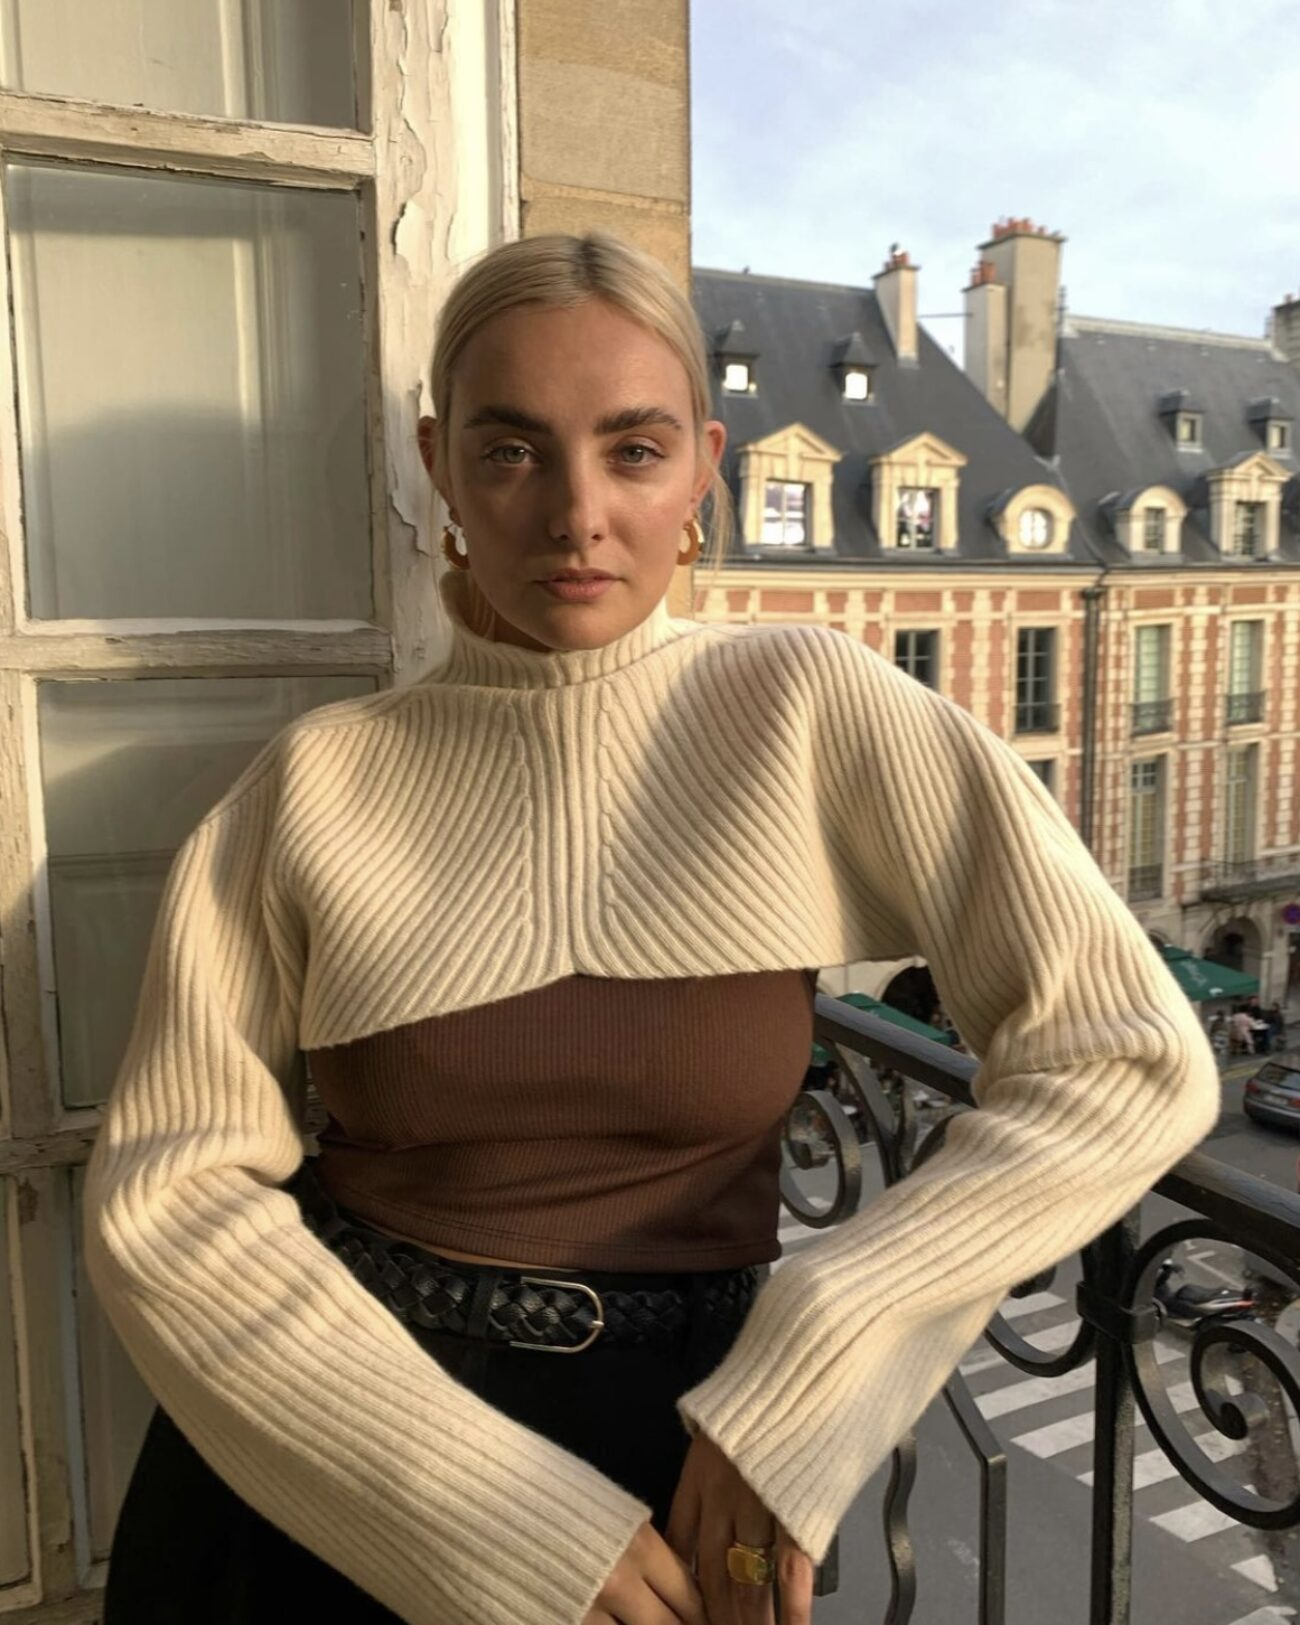 Paulien Riemis wearing EMIN + PAUL cream super crop jumper.